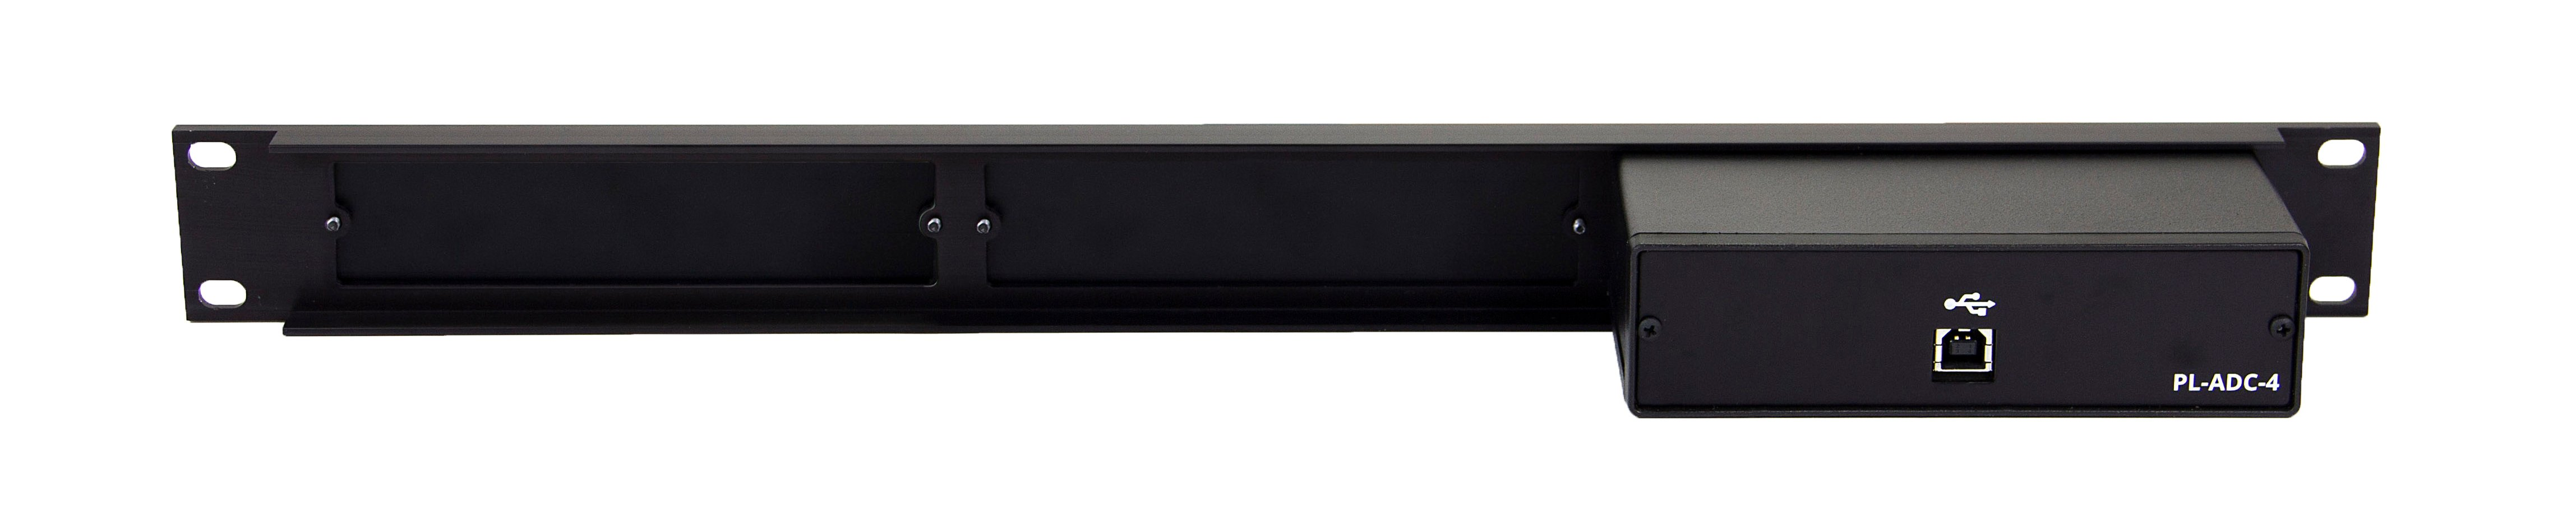 ListenWiFi 4 Stereo / 8 Mono Channel Audio Interface, 1 RU